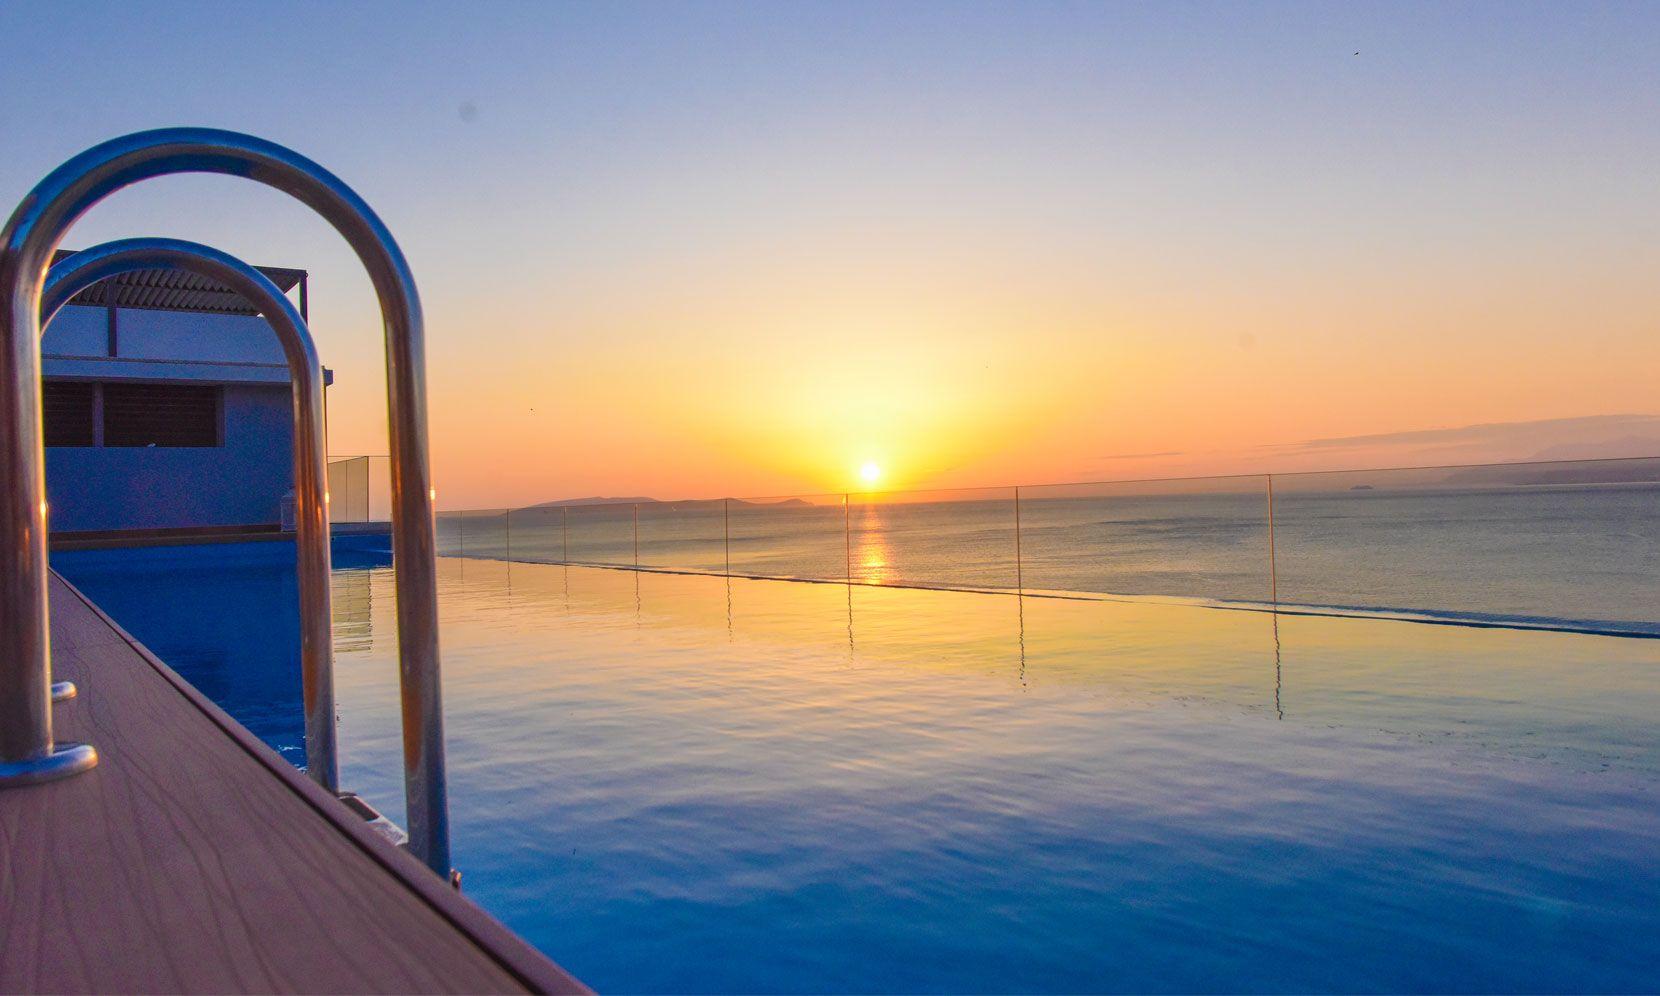 Crete Villa Tyrion jumbotron image